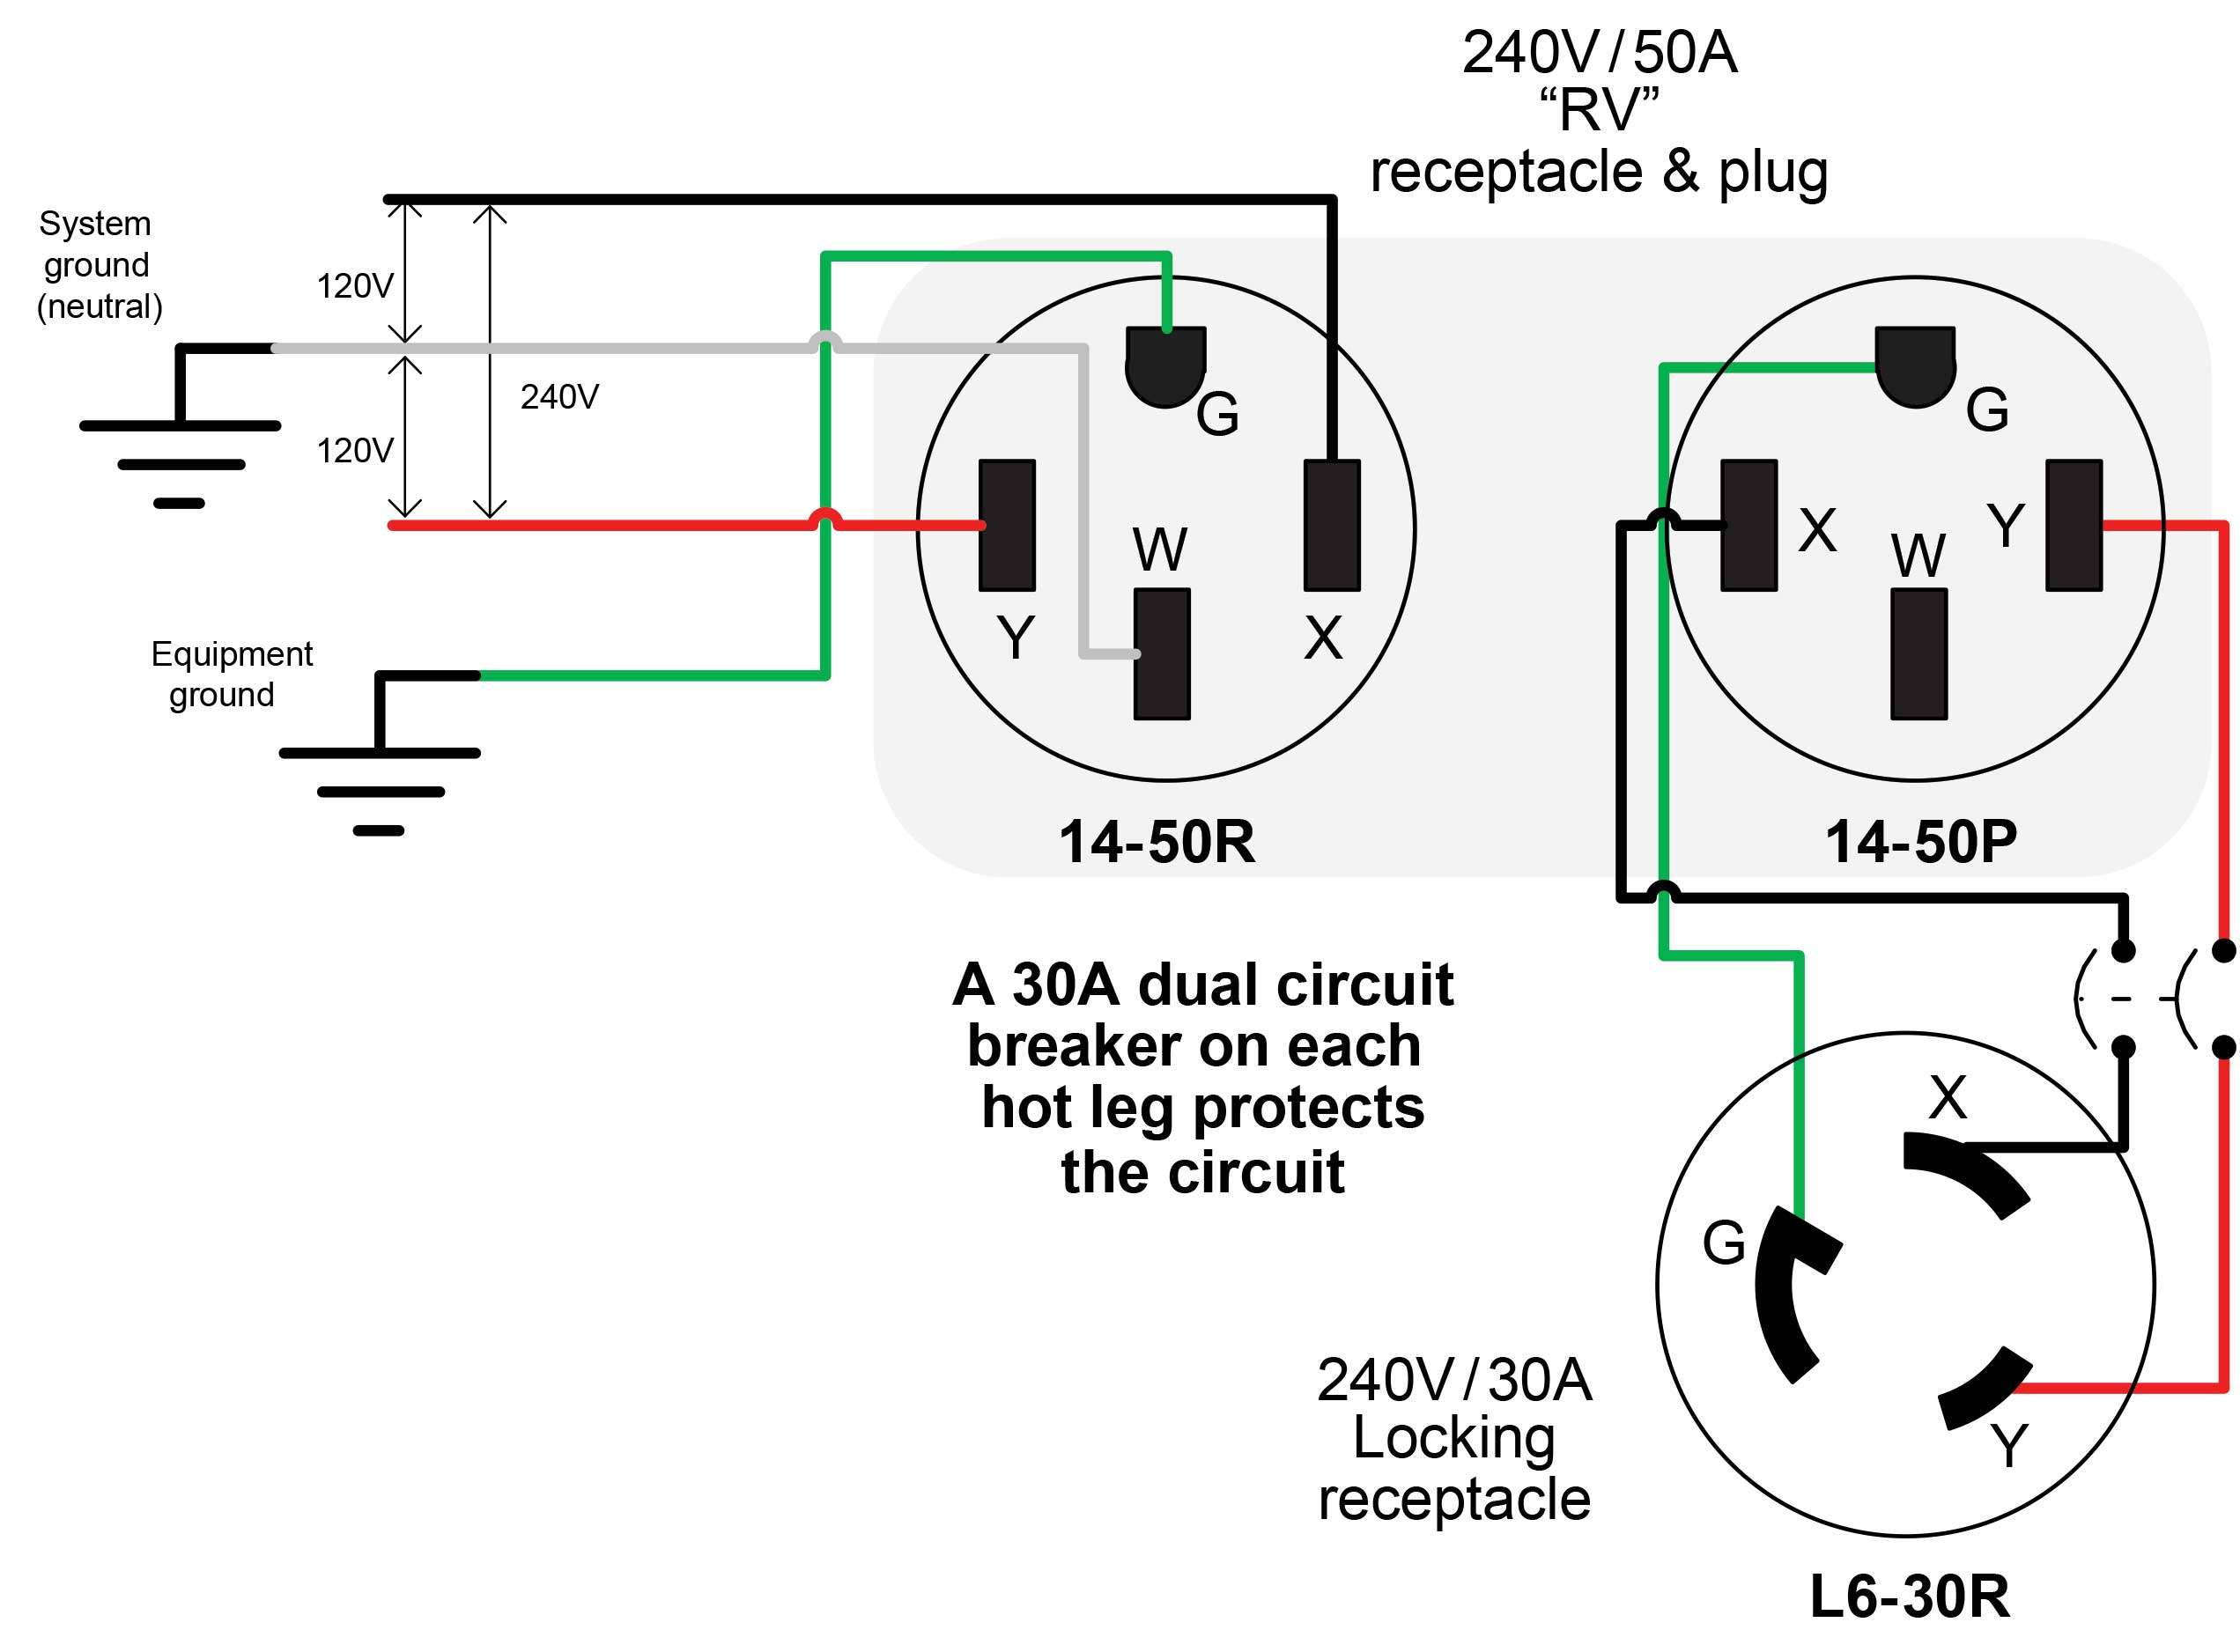 figure_7?resize\=620%2C457 l6 30r wiring diagram nema l6 30 wiring \u2022 free wiring diagrams 240 Single Phase Wiring Diagram at virtualis.co